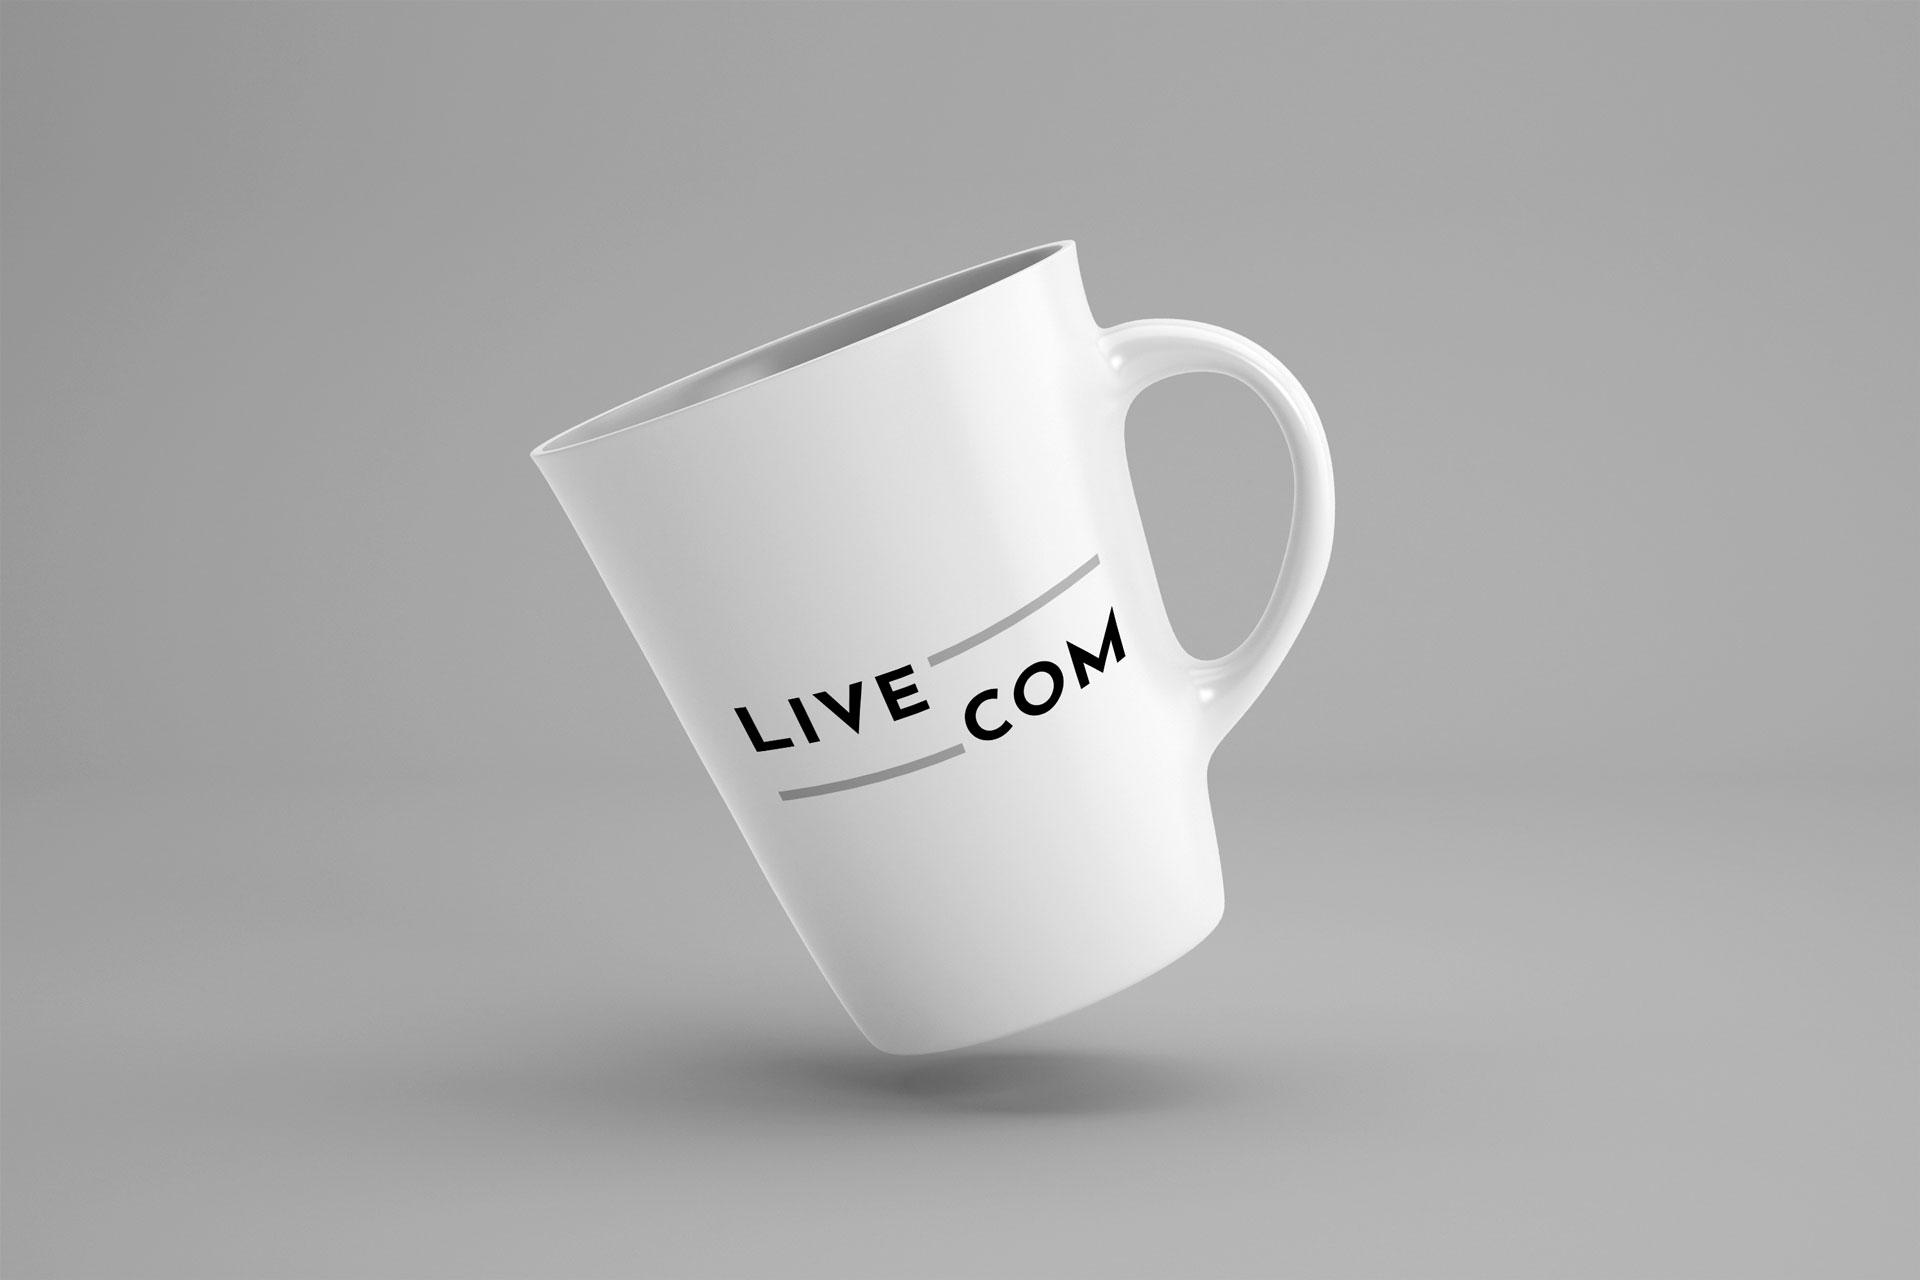 mockup logo livecom rouen client i-media agence de communication digitale